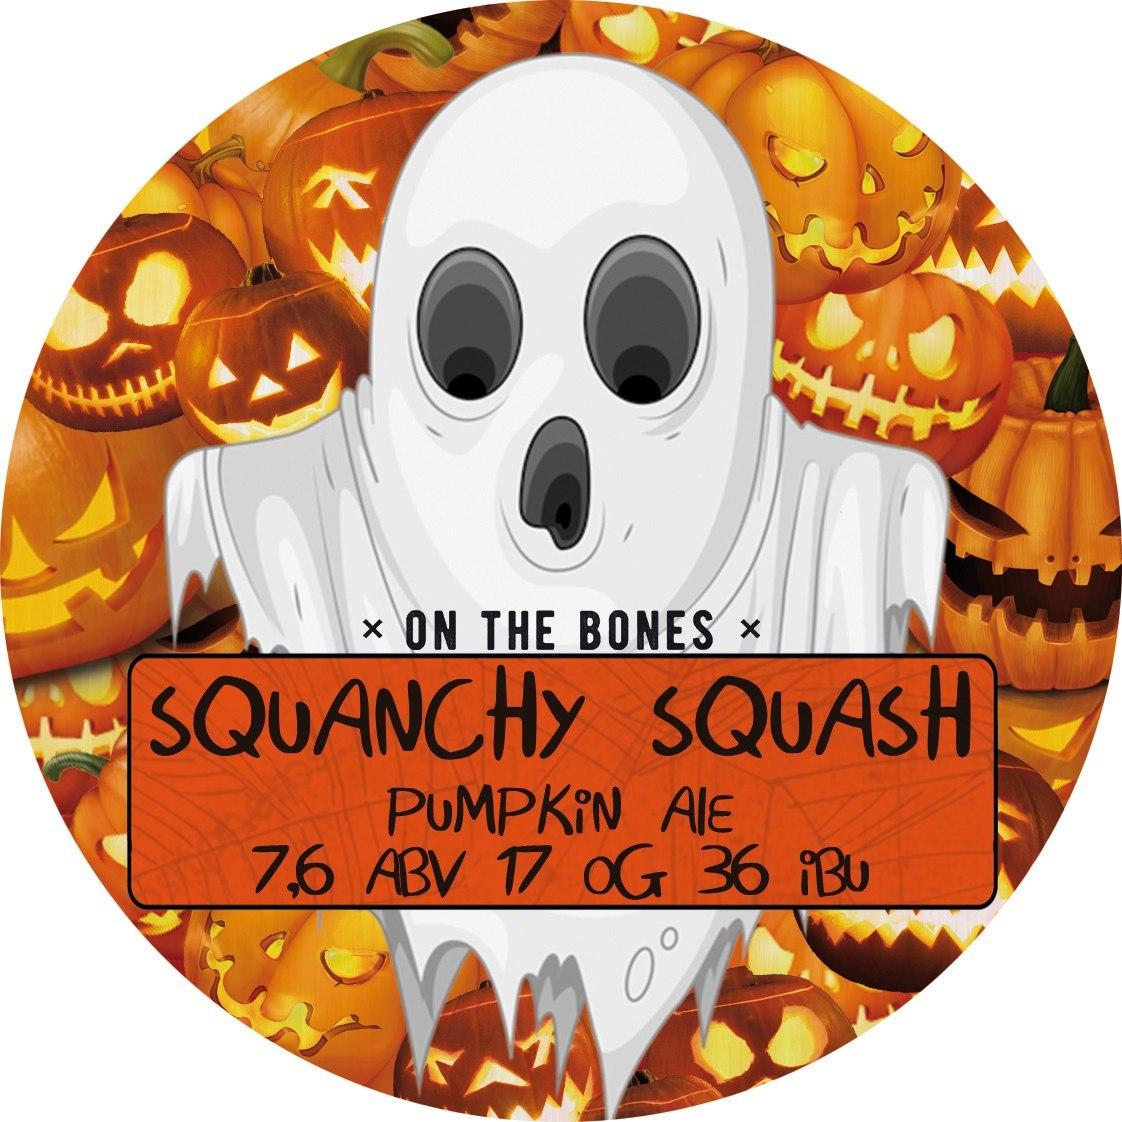 https://static-ru.insales.ru/images/products/1/792/134390552/Squanchy_Squash_пиво_On_the_bones.jpg